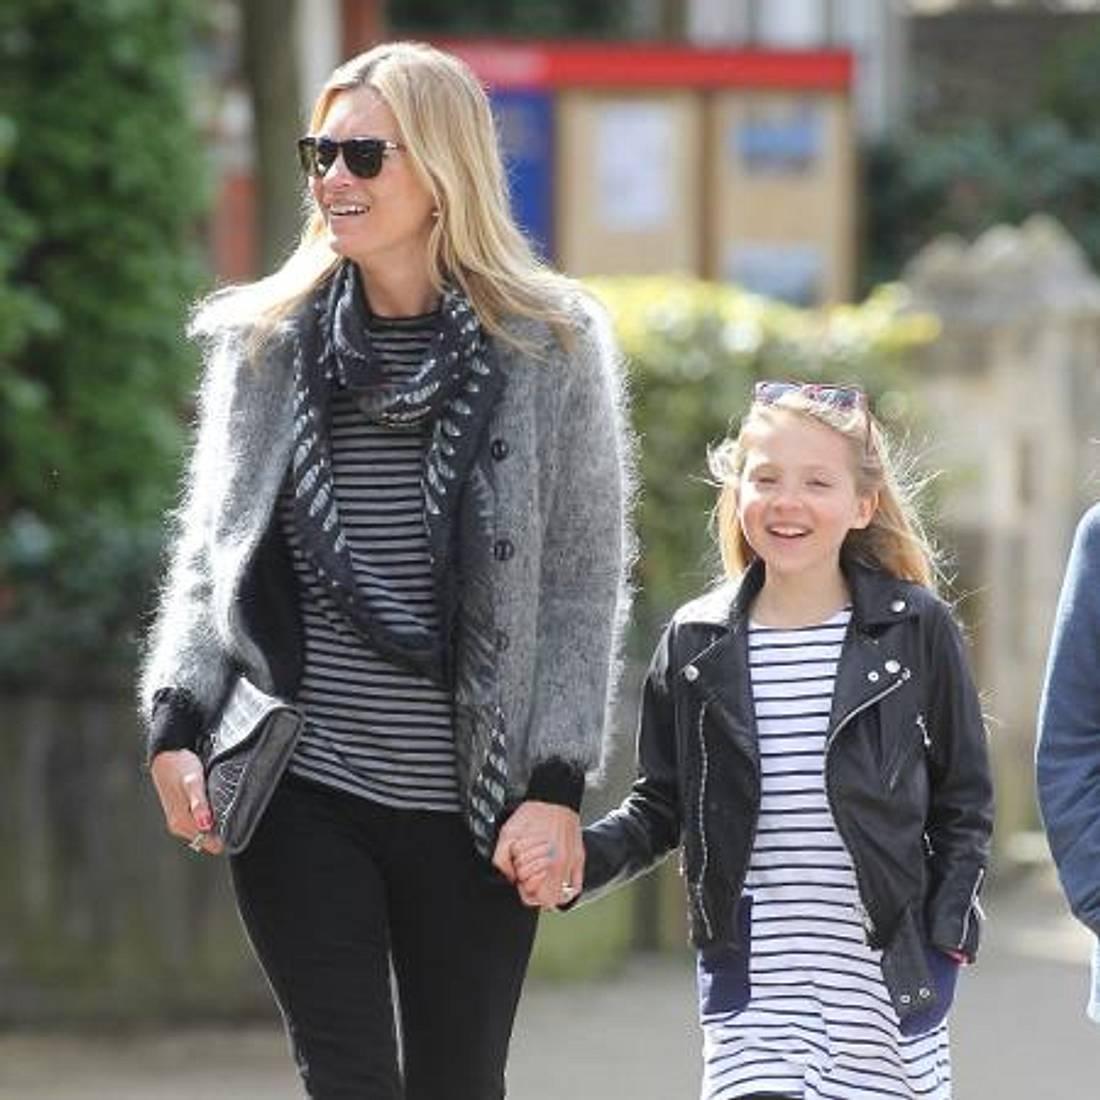 Kate Moss' Tochter Lila Grace hat auch Model-Ambitionen